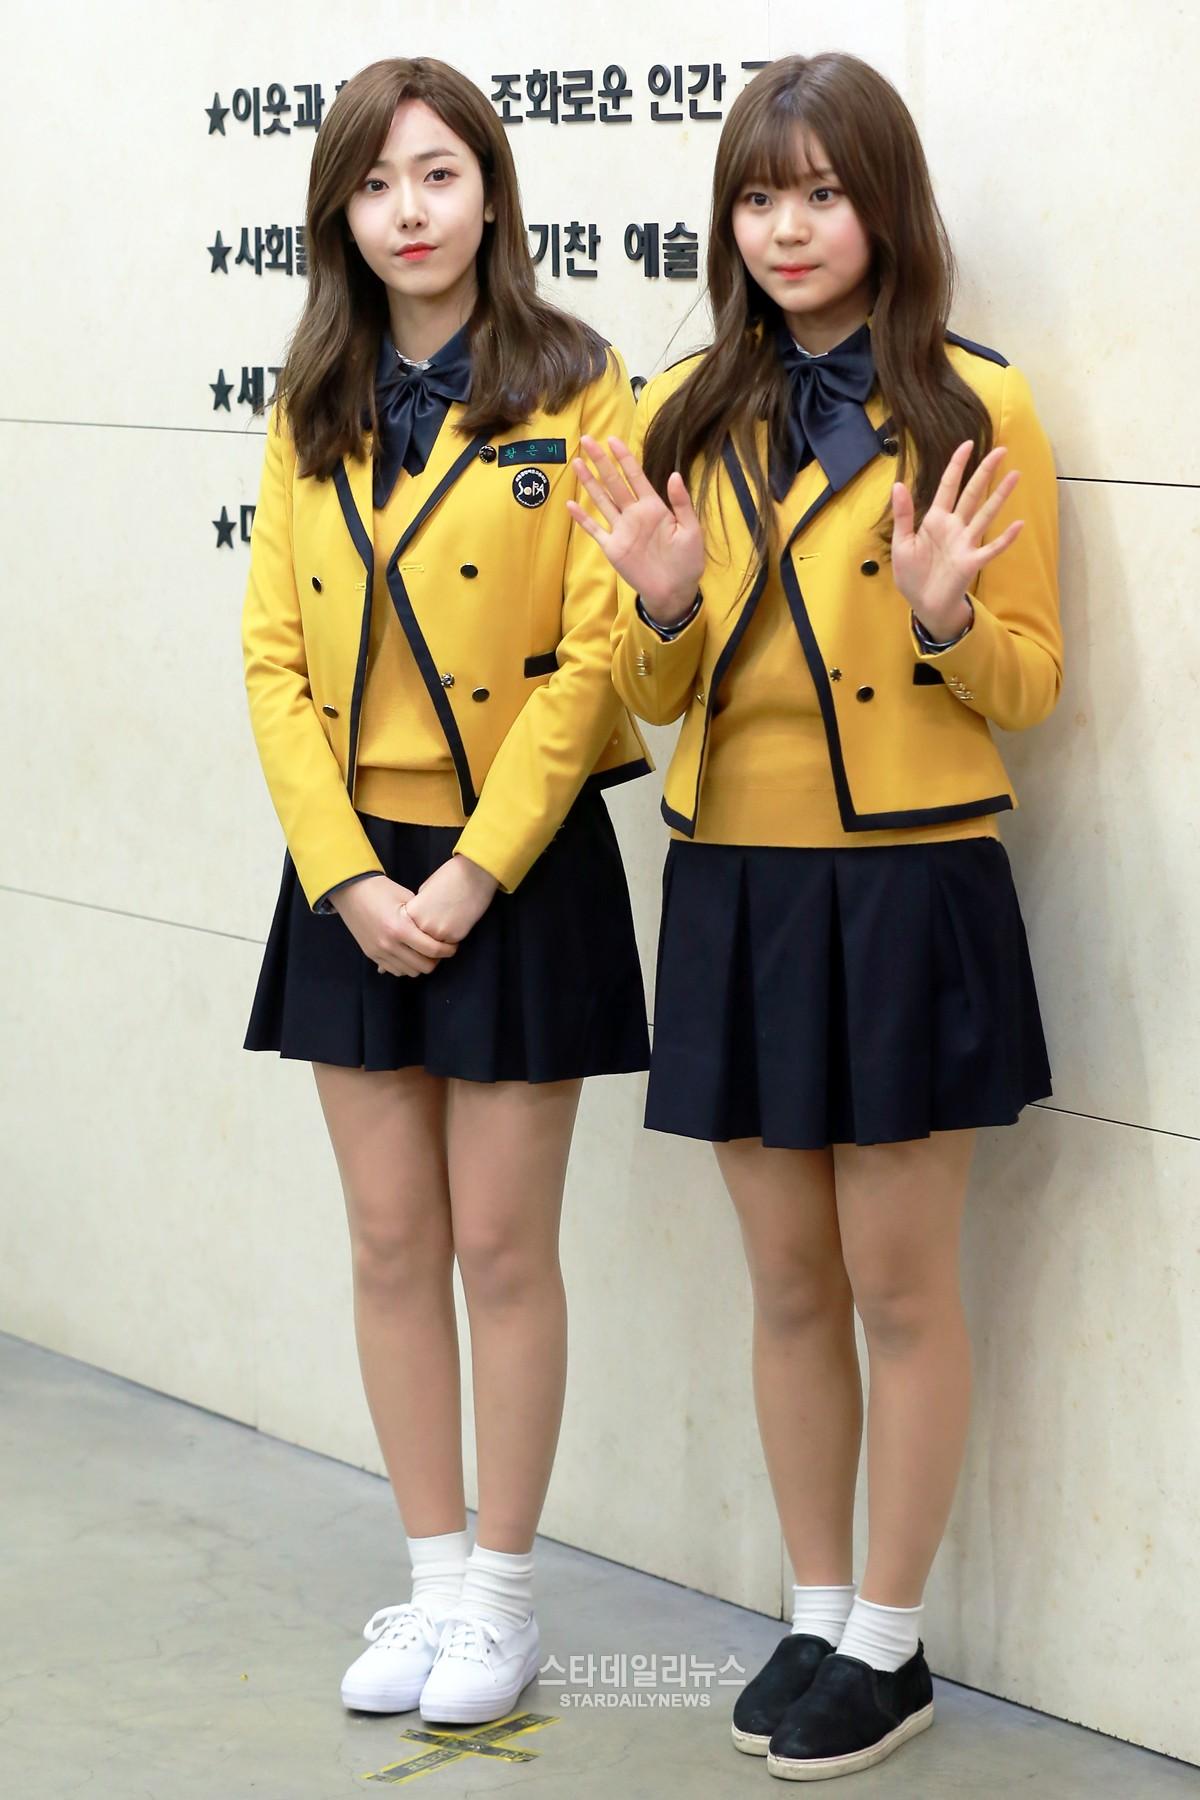 gfriend graduation star daily news